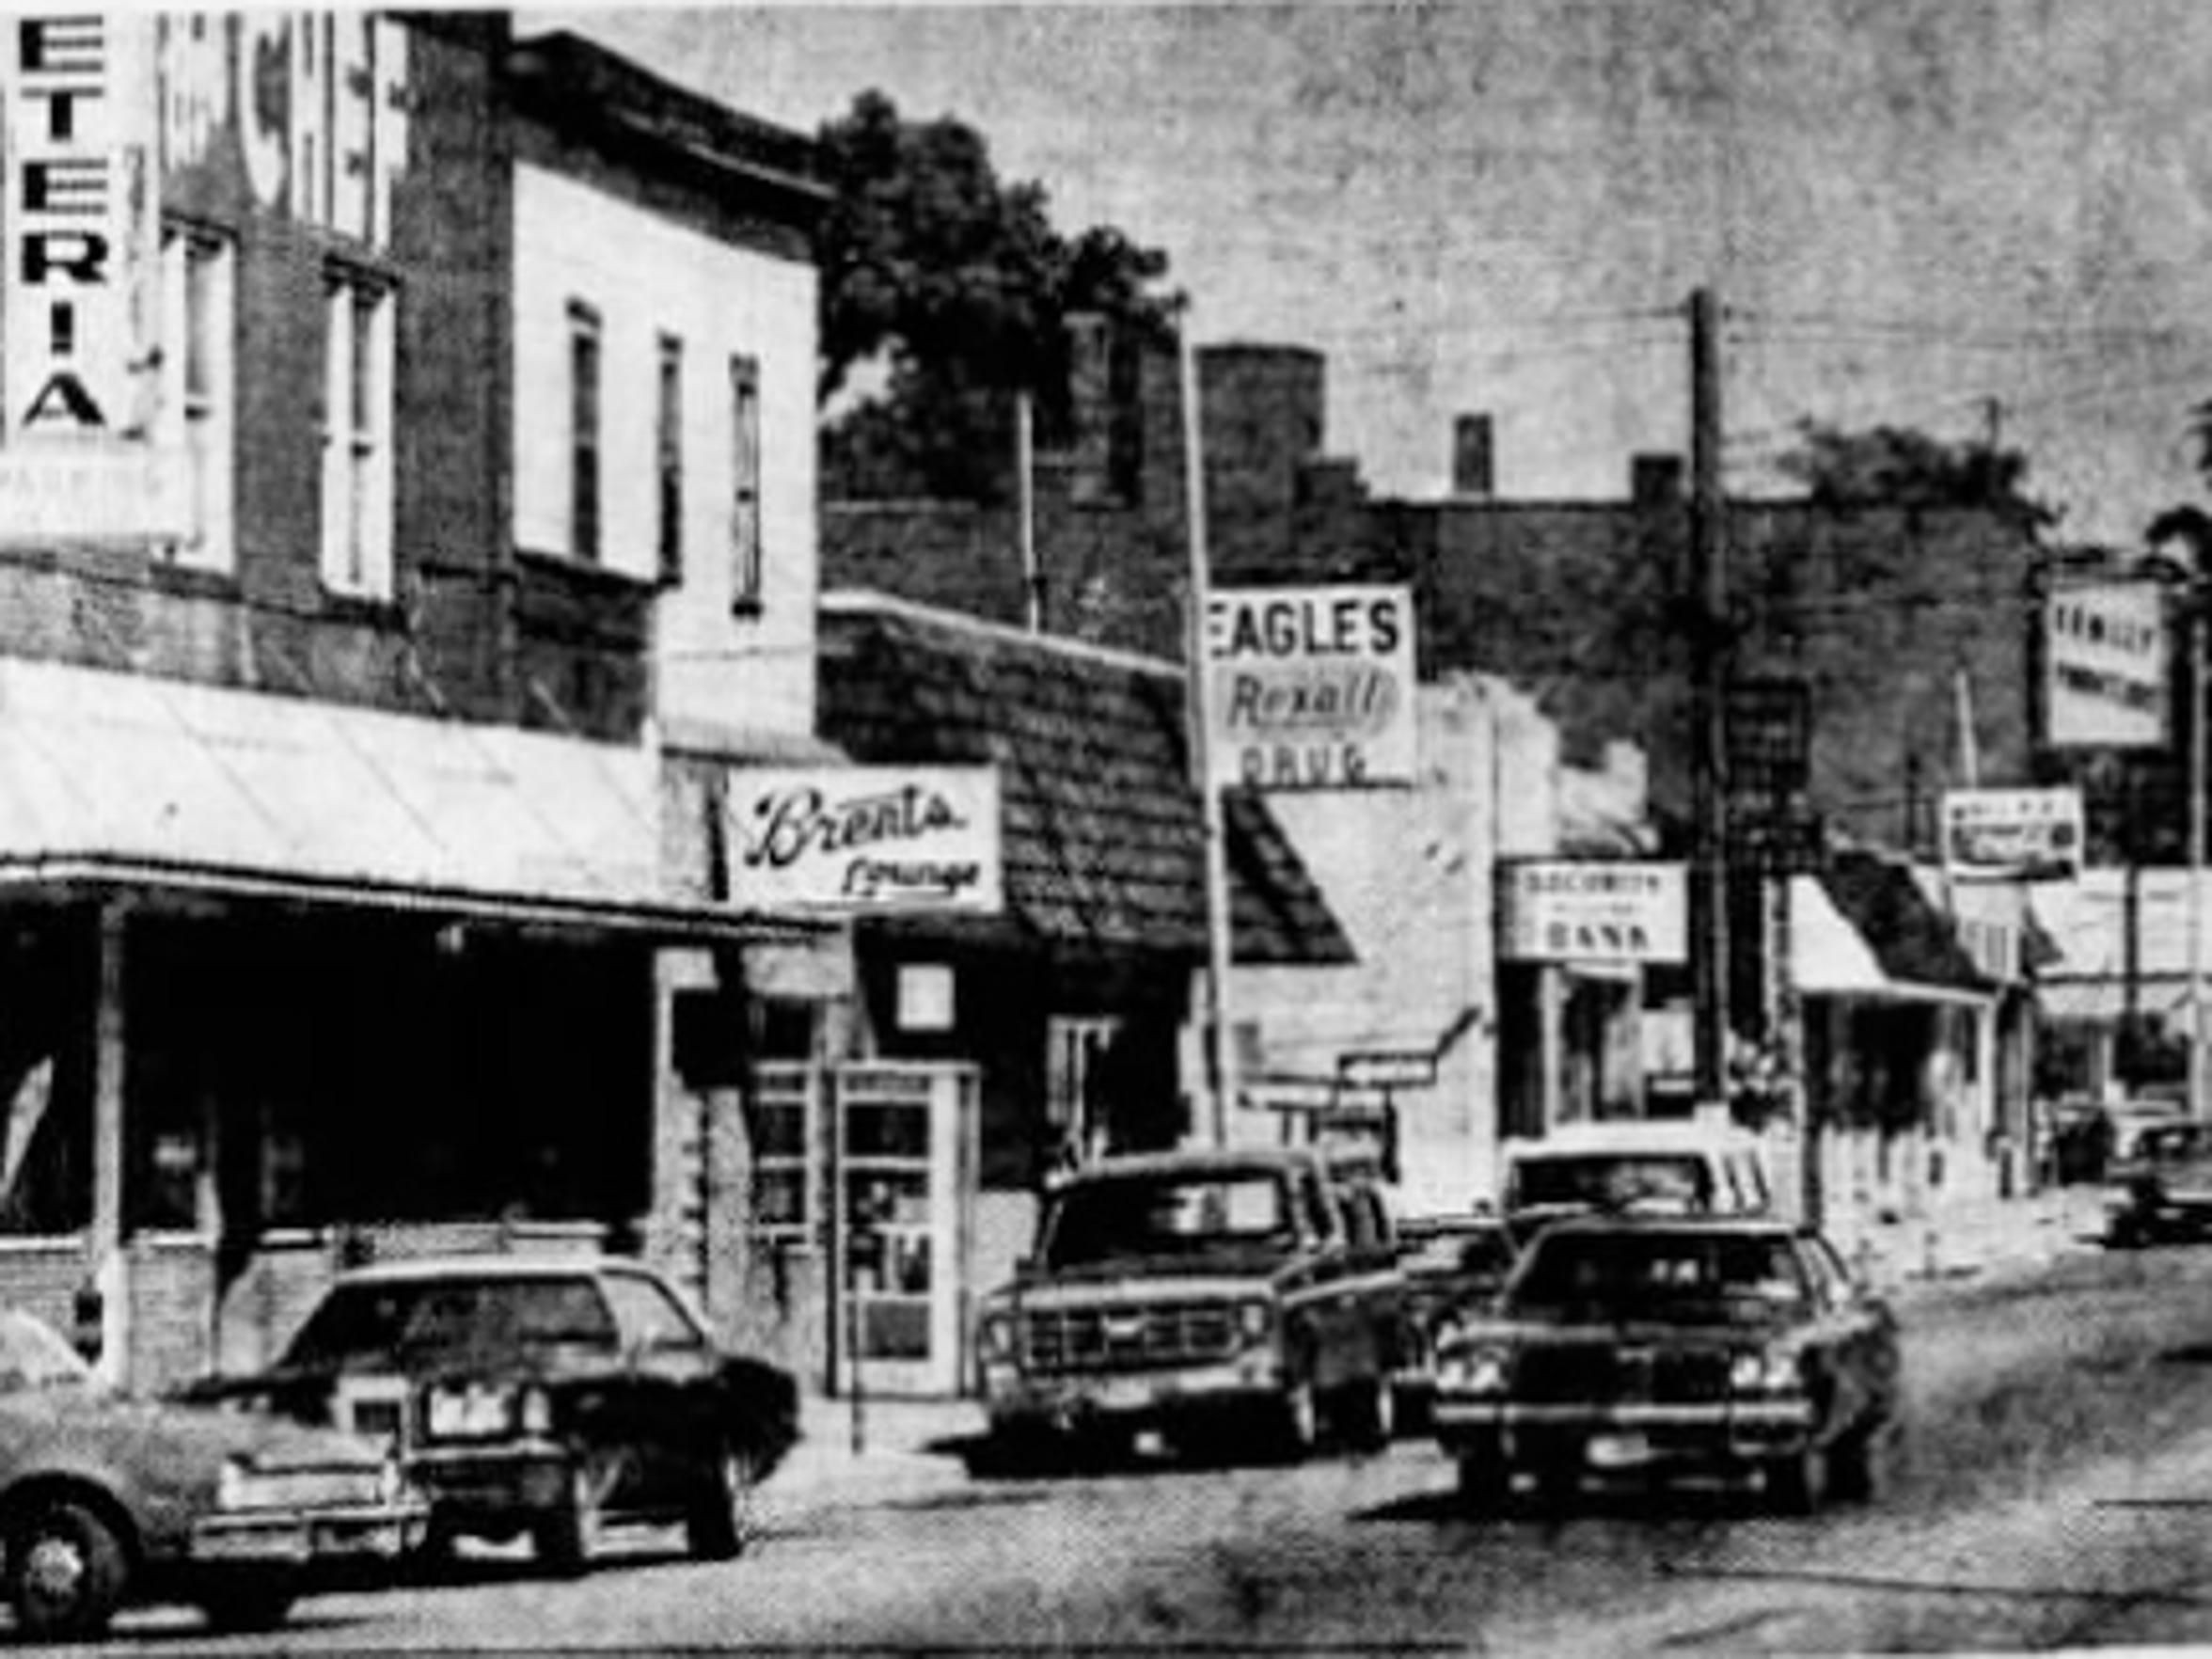 Postumville's business district in 1978.